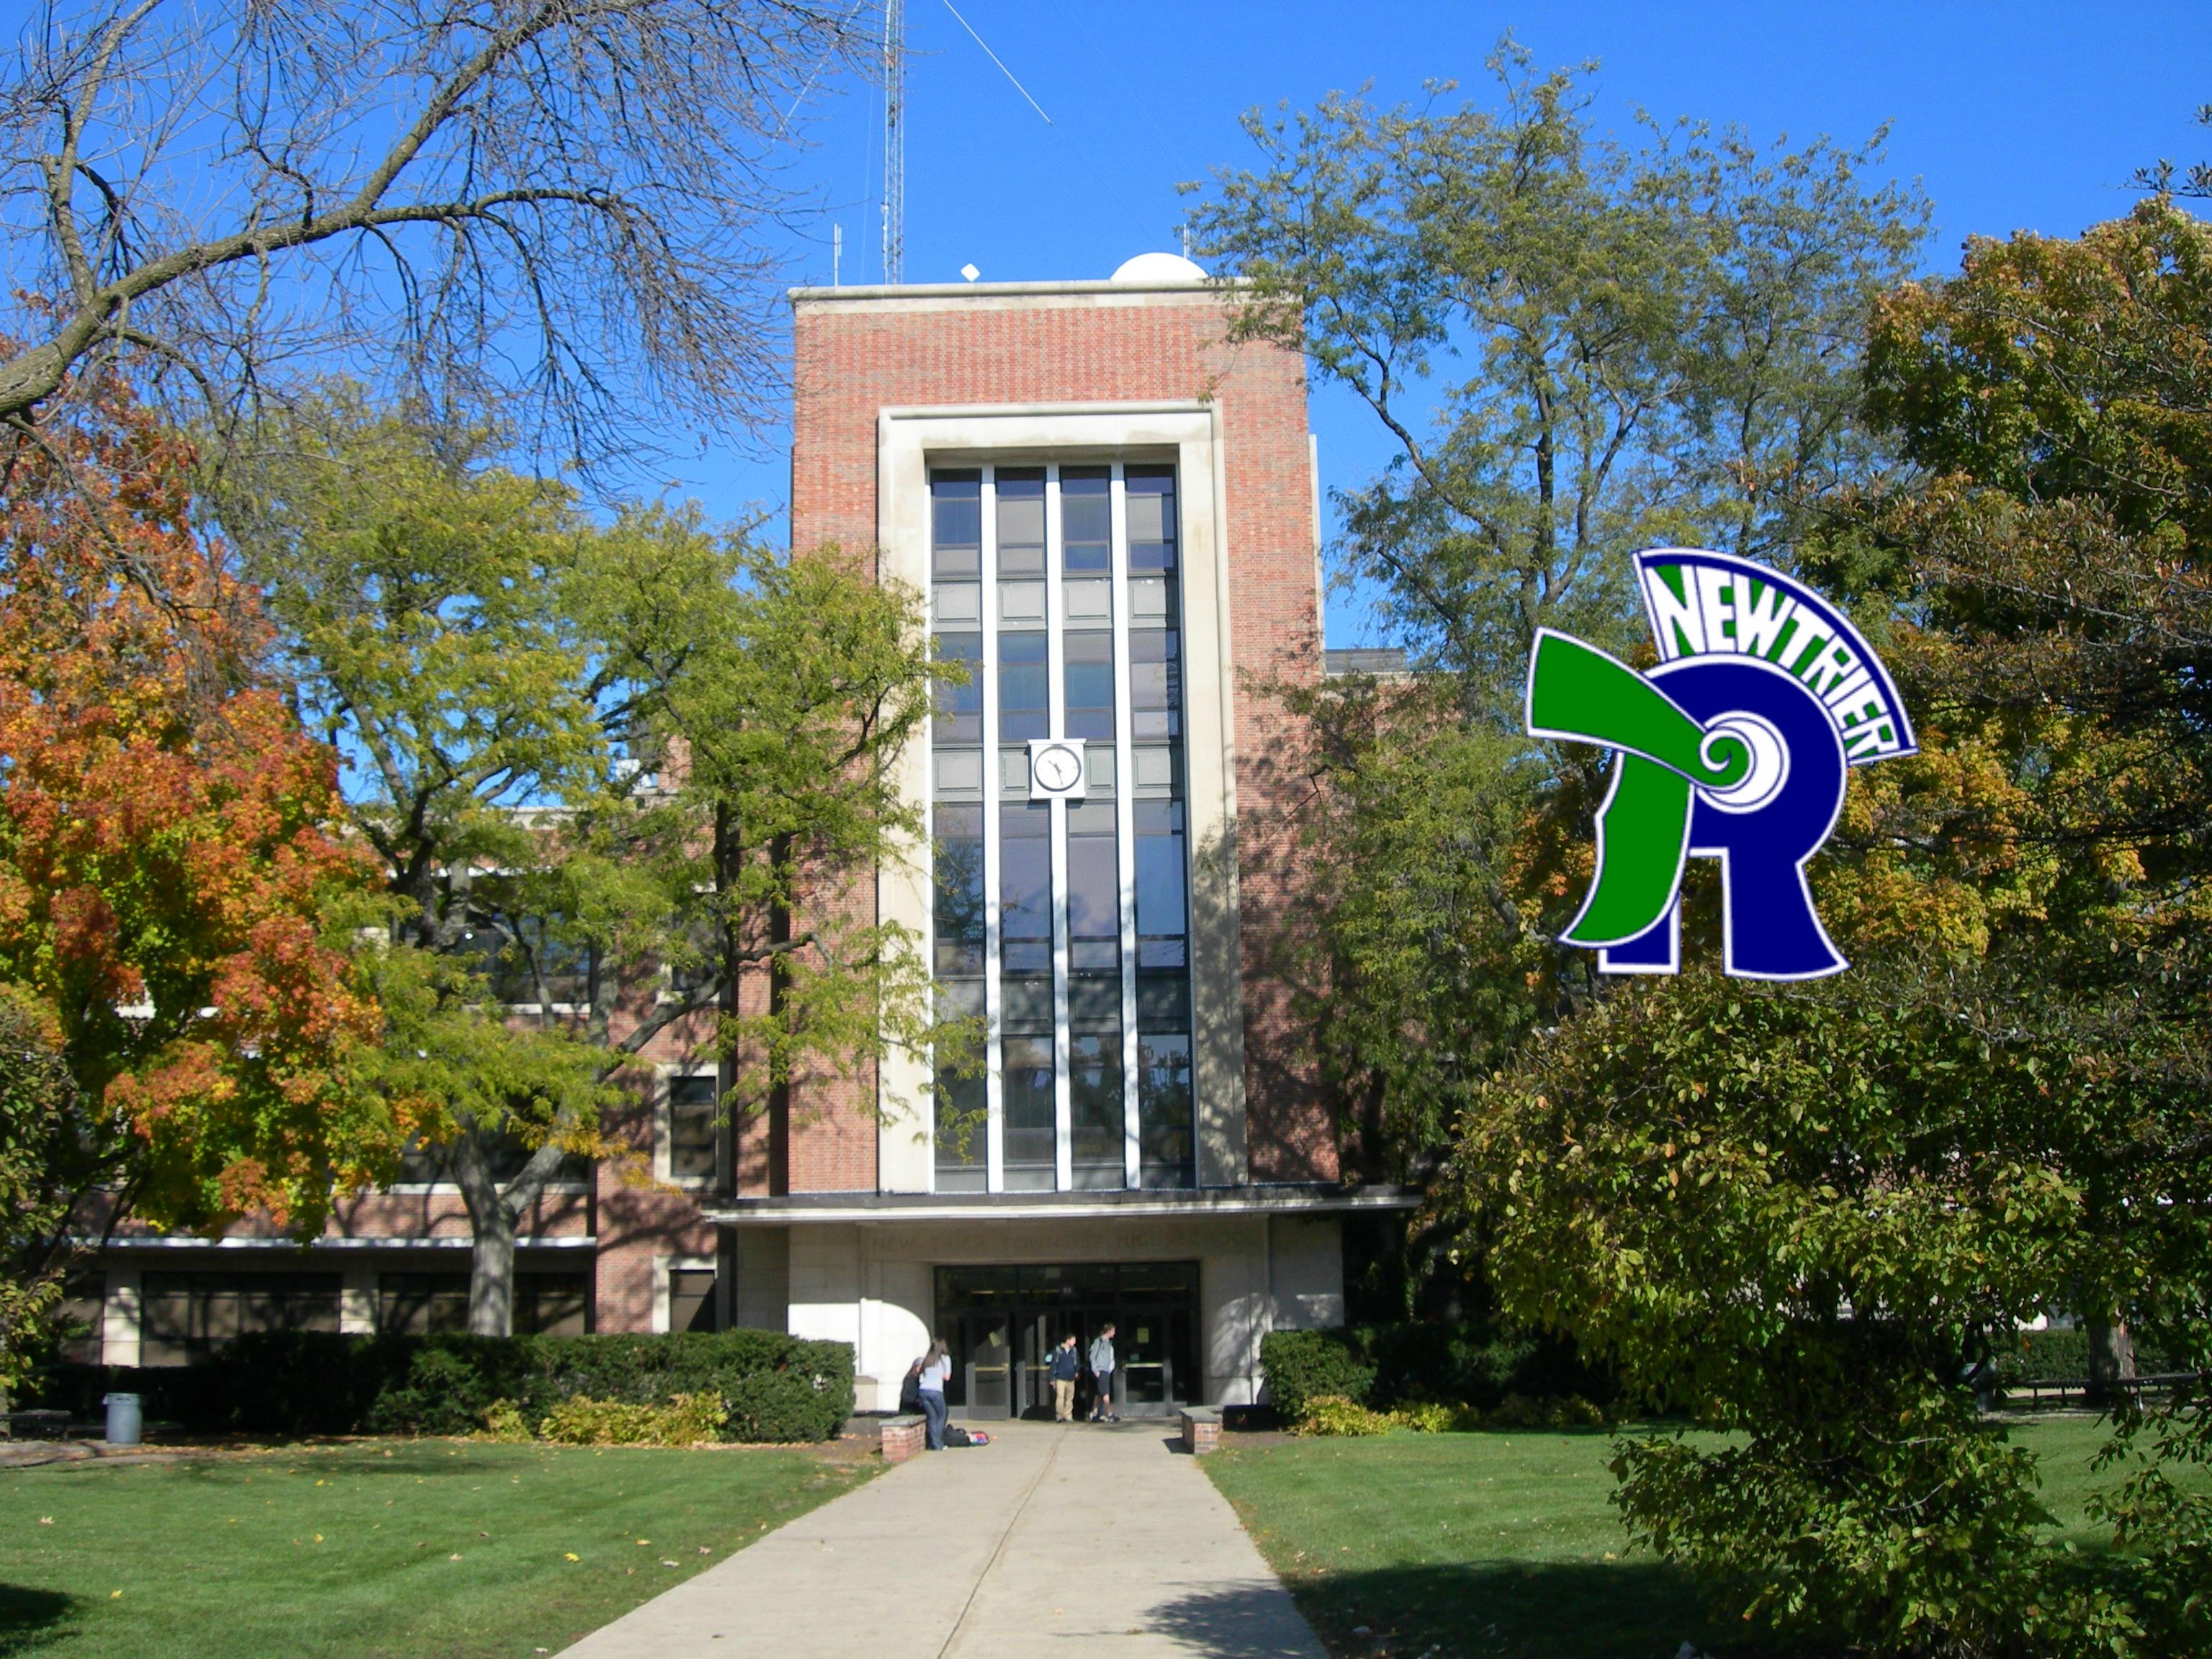 New trier high school district - Garden city union free school district ...